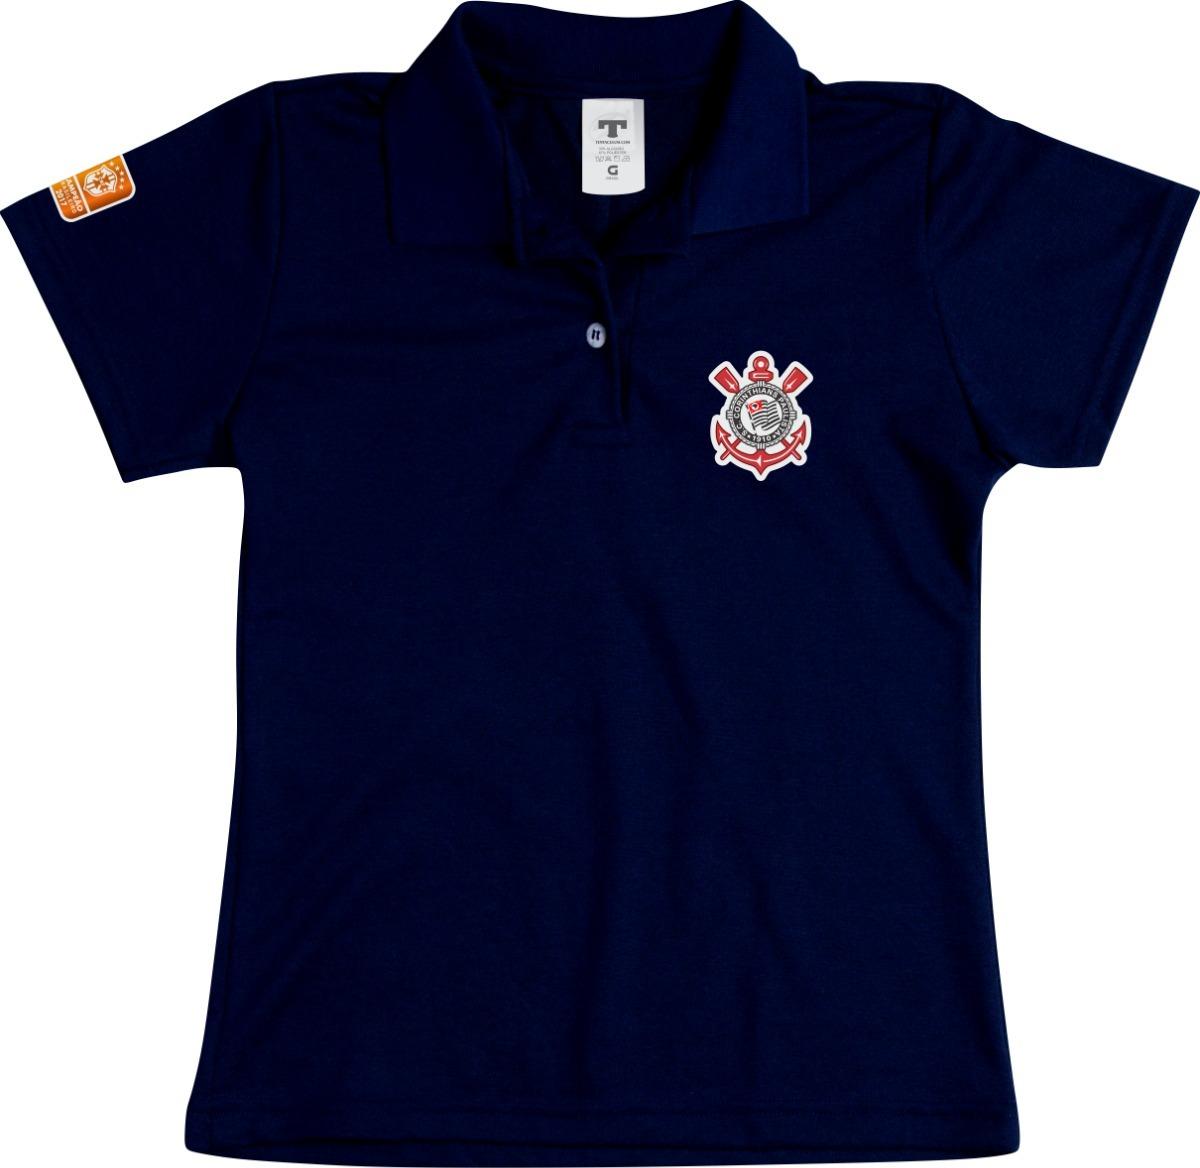 b2cab86b4b713 camisa polo feminina corinthians baby look especial preto. Carregando zoom.